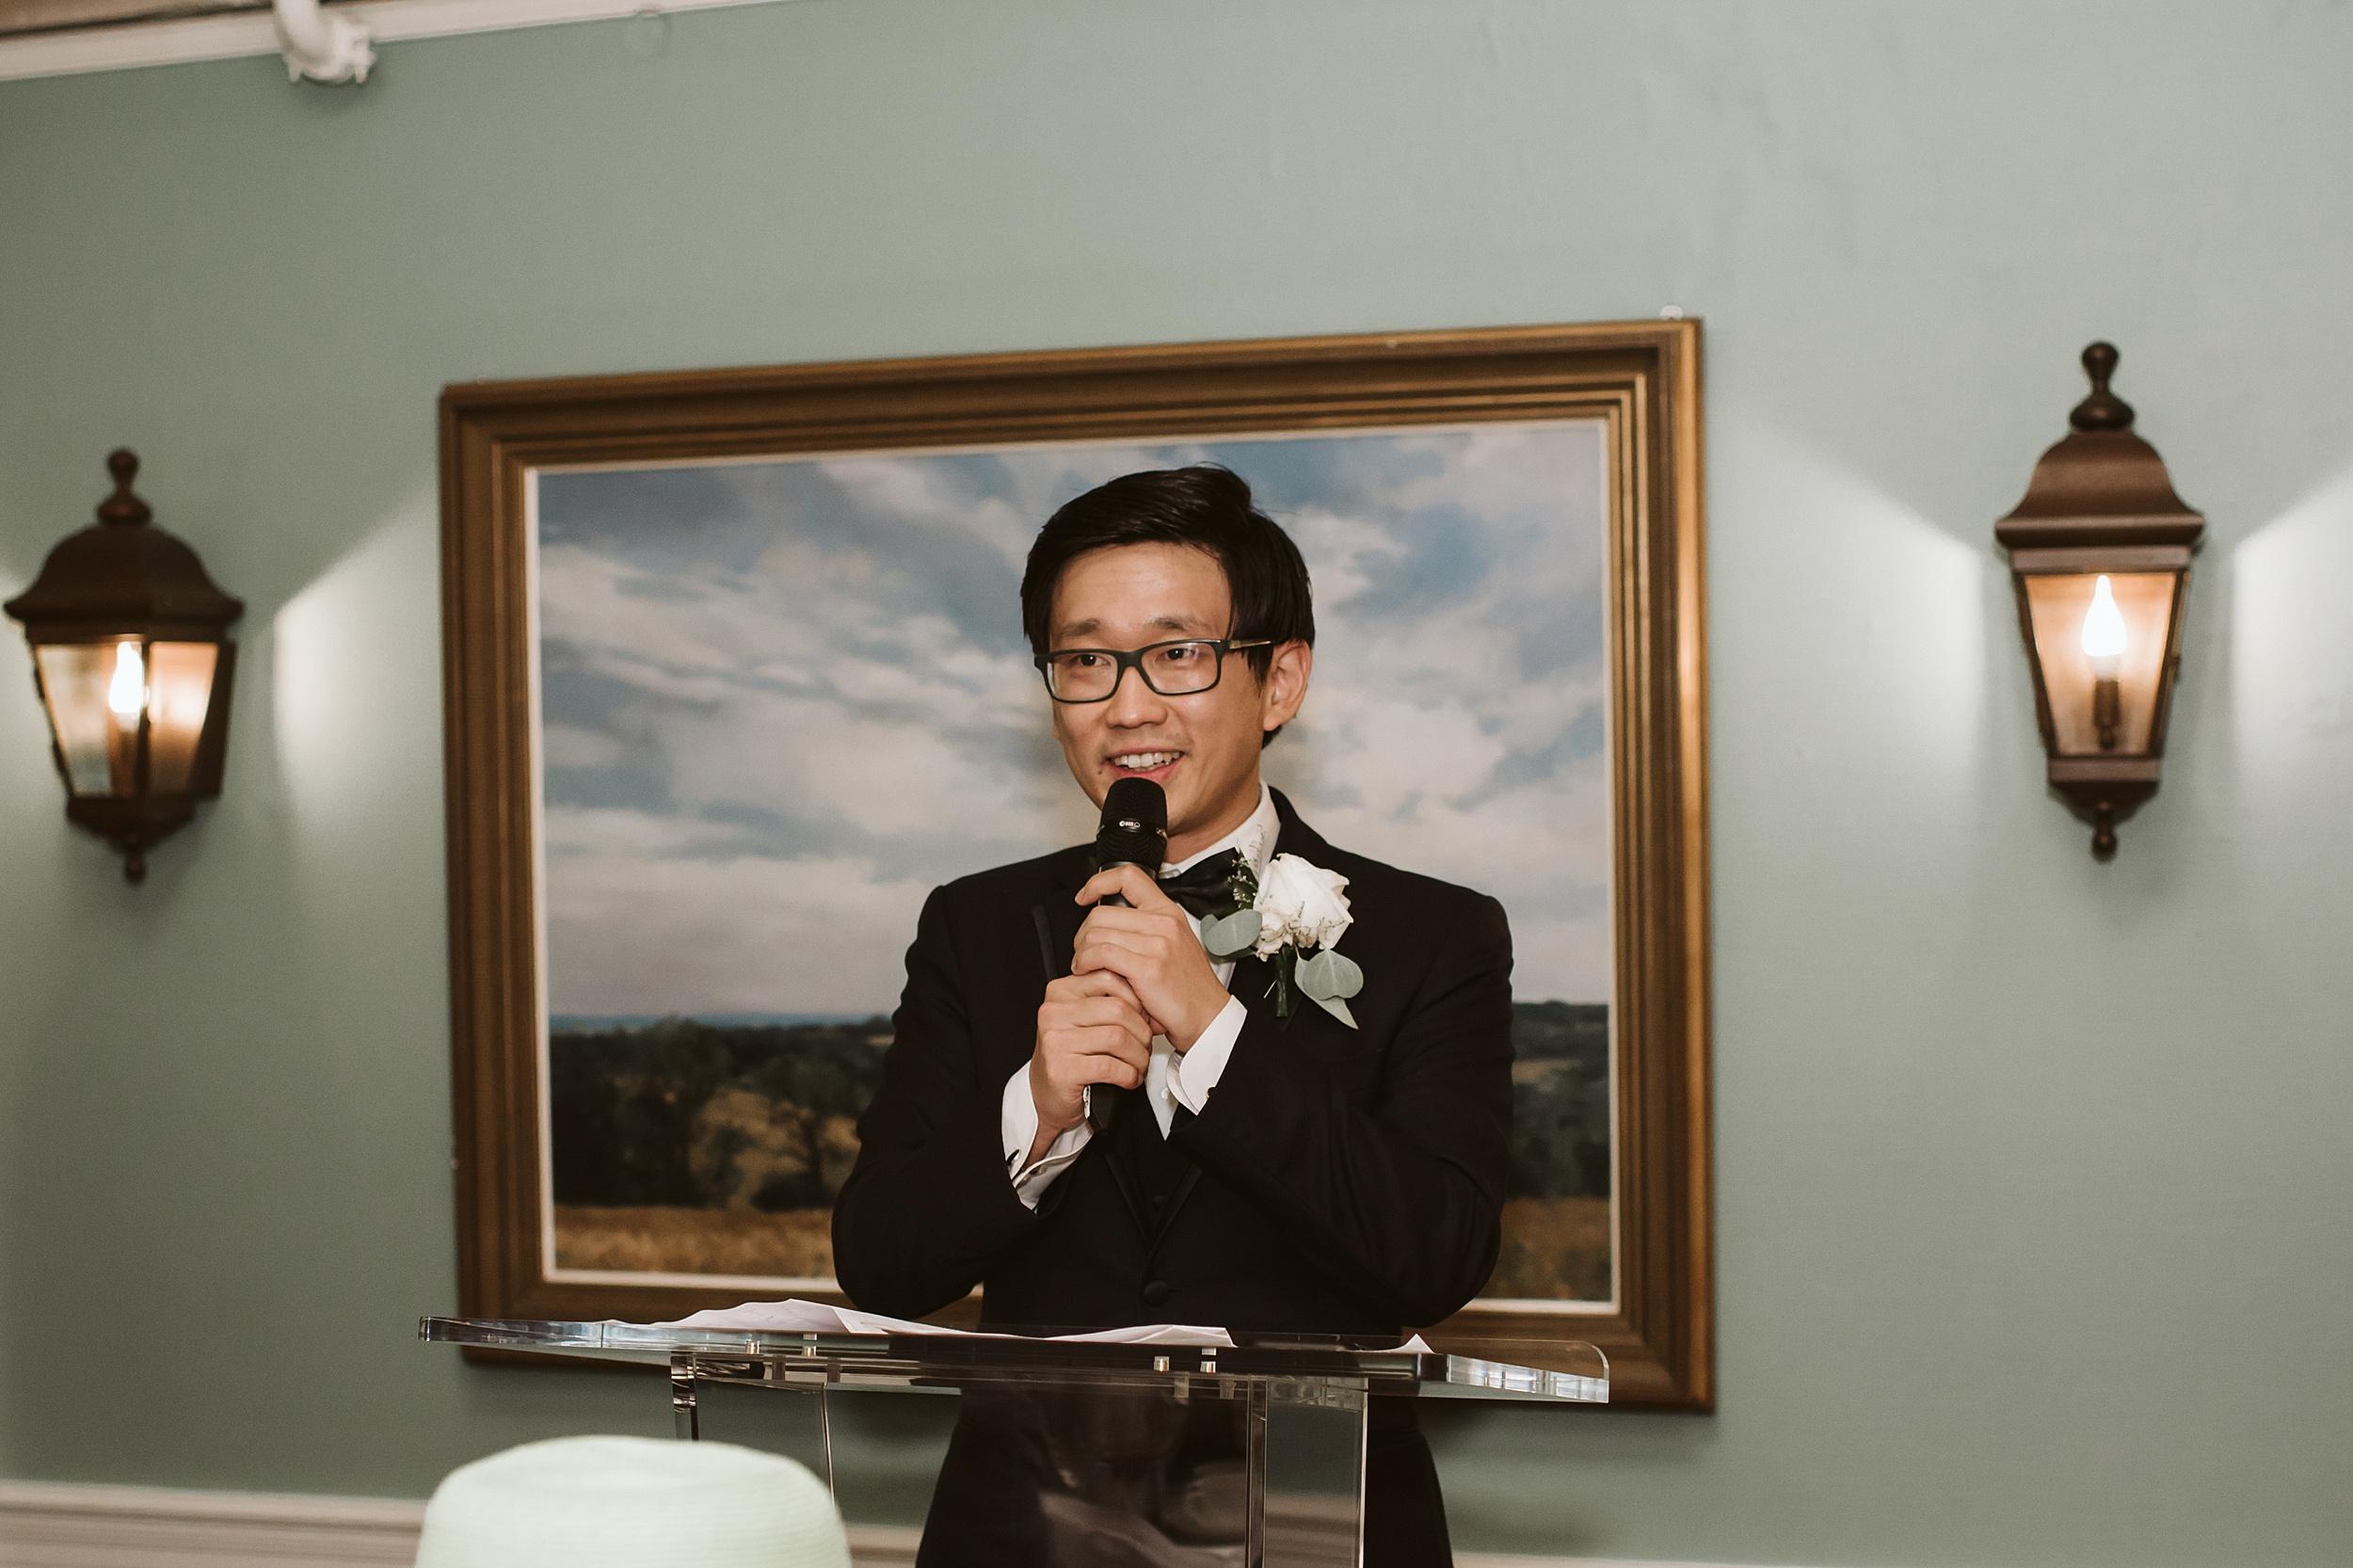 Doctors_House_Kleinburg_Wedding_Toronto_Photographer_0087.jpg